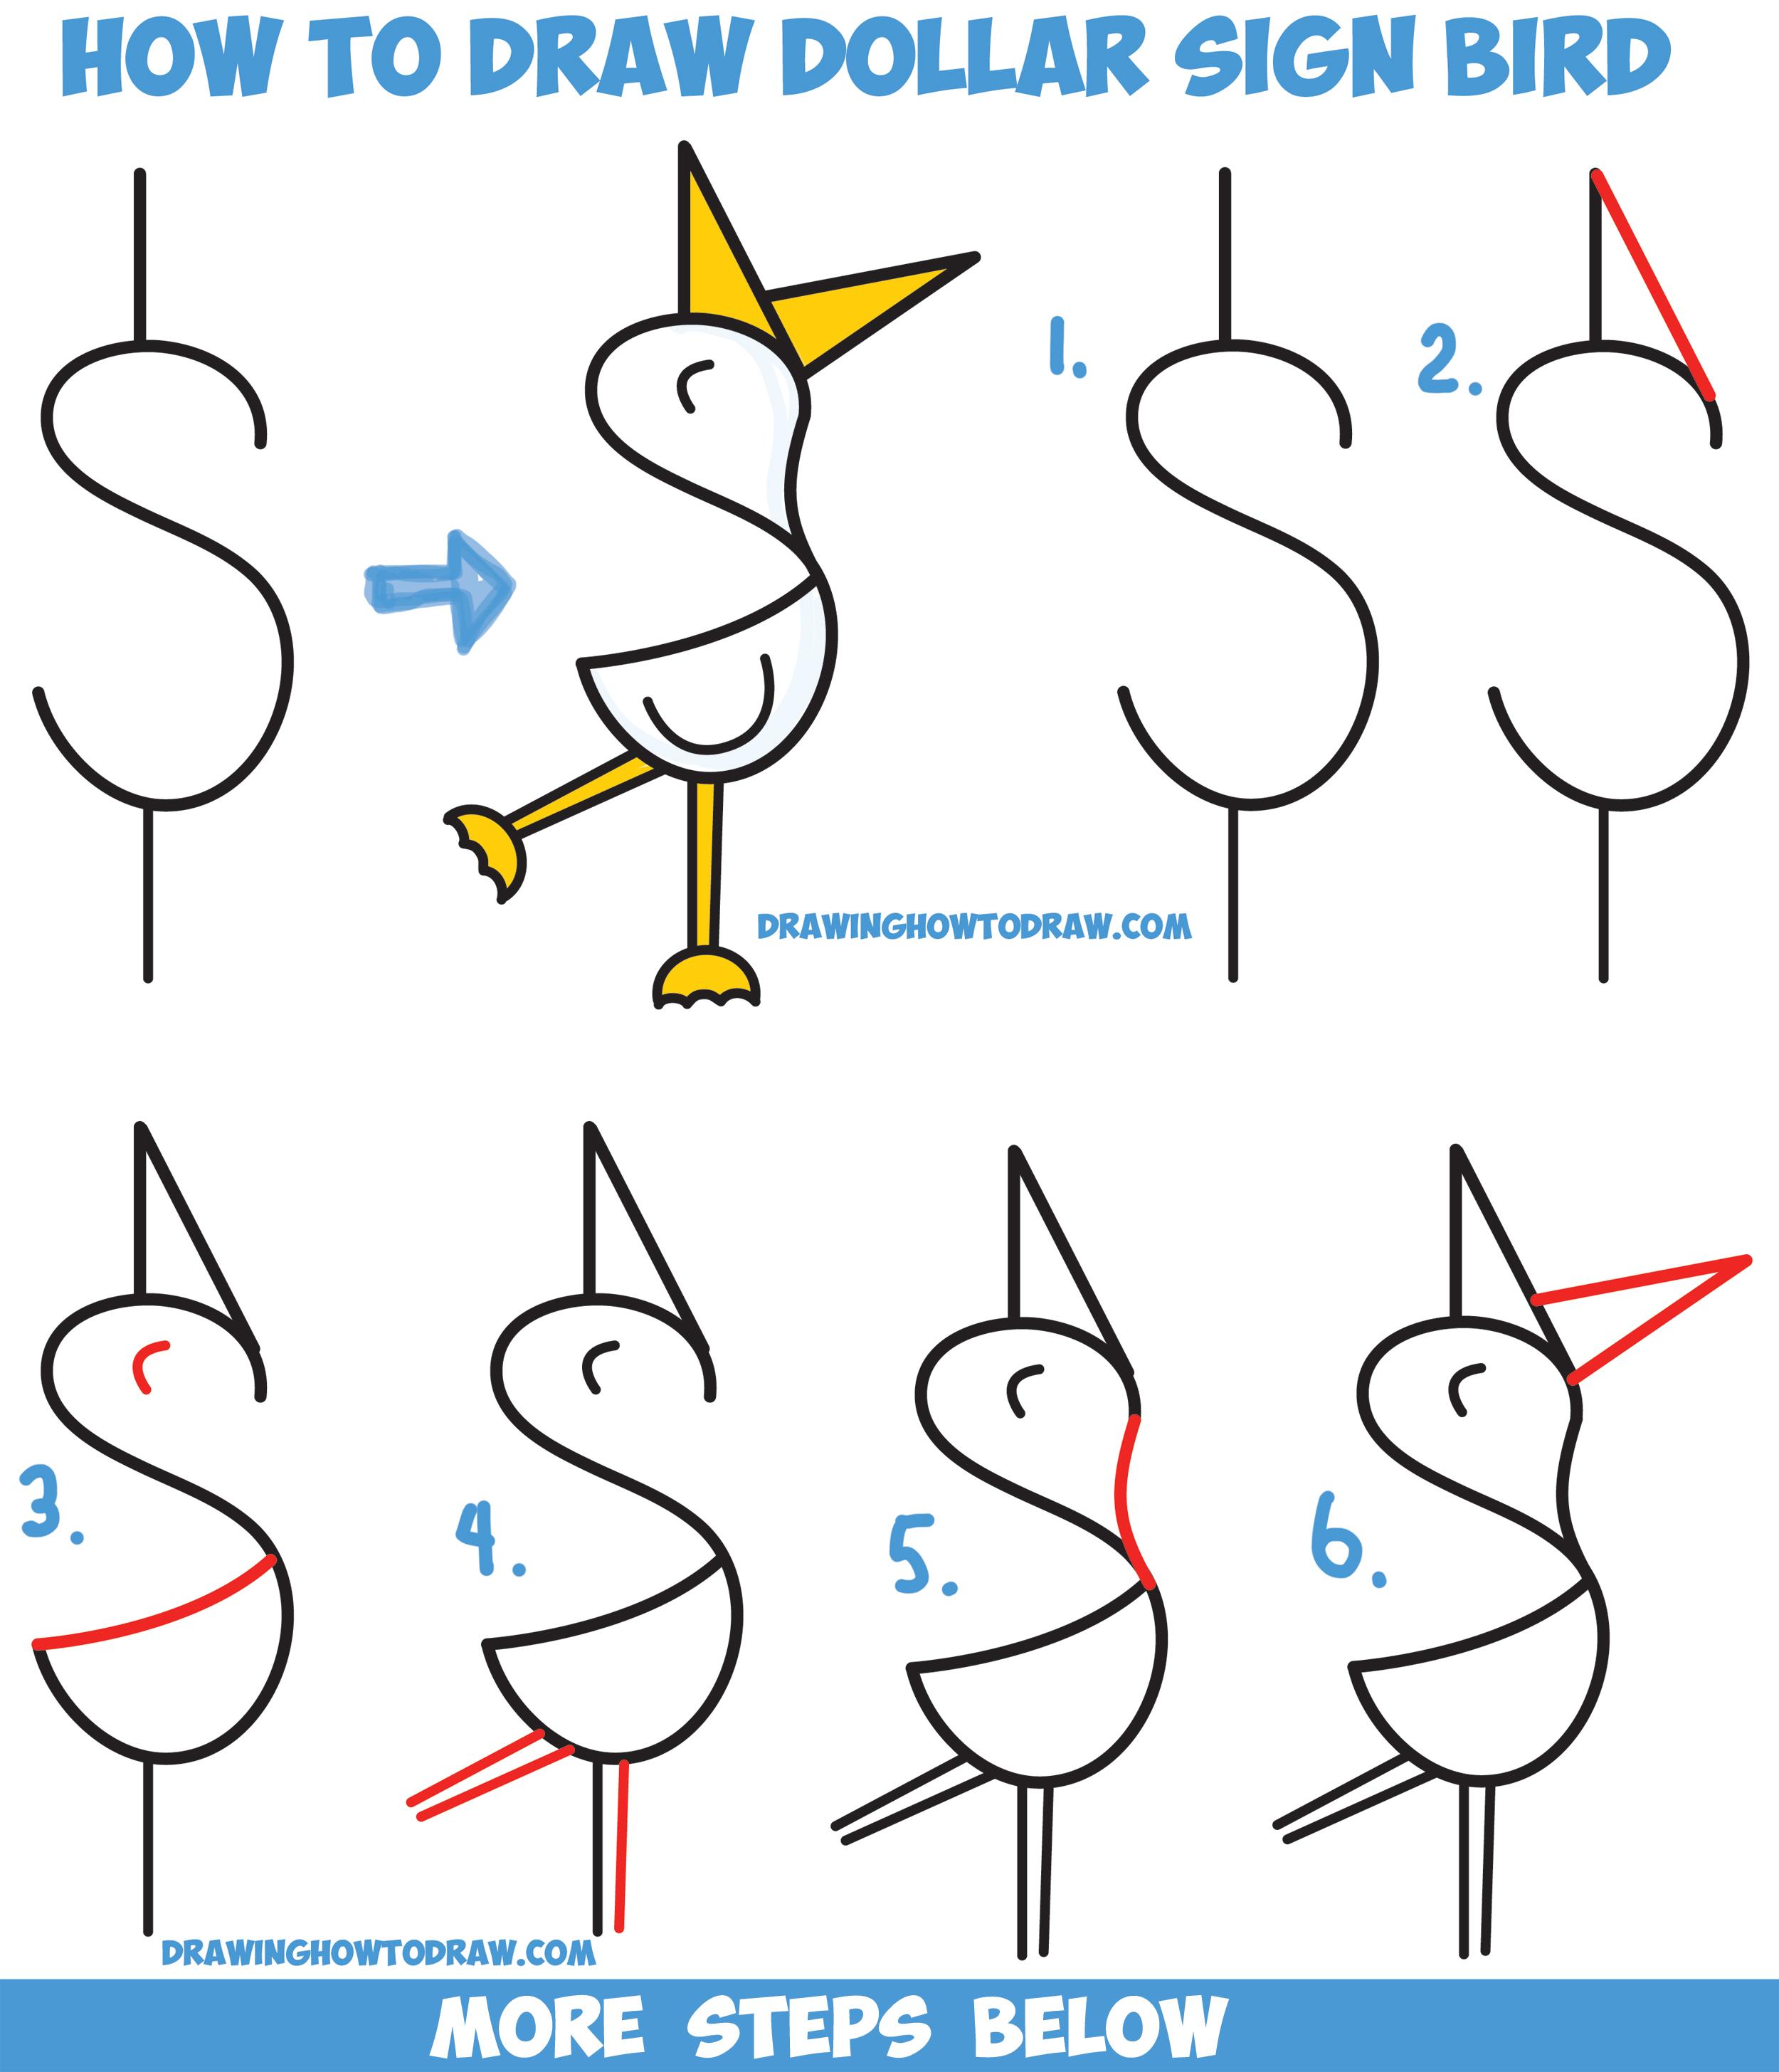 2500x2911 How To Draw A Cute Cartoon Bird Duck From A Dollar Sign